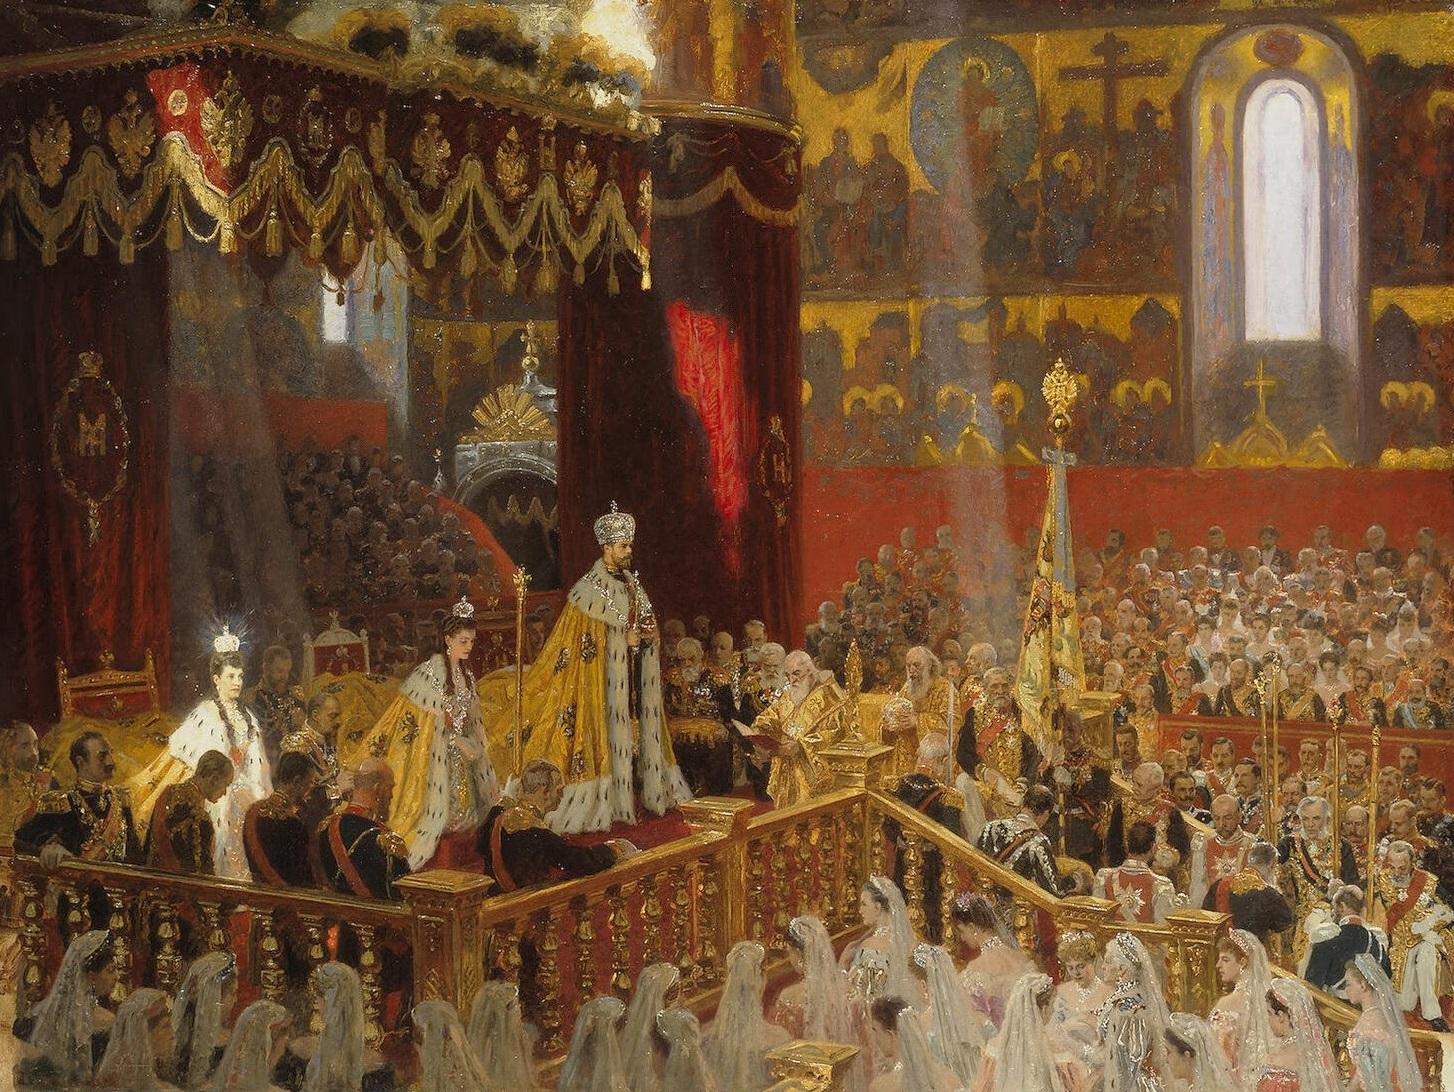 Coronation_of_Nicholas_II_by_L.Tuxen_(1898,_Hermitage).jpg